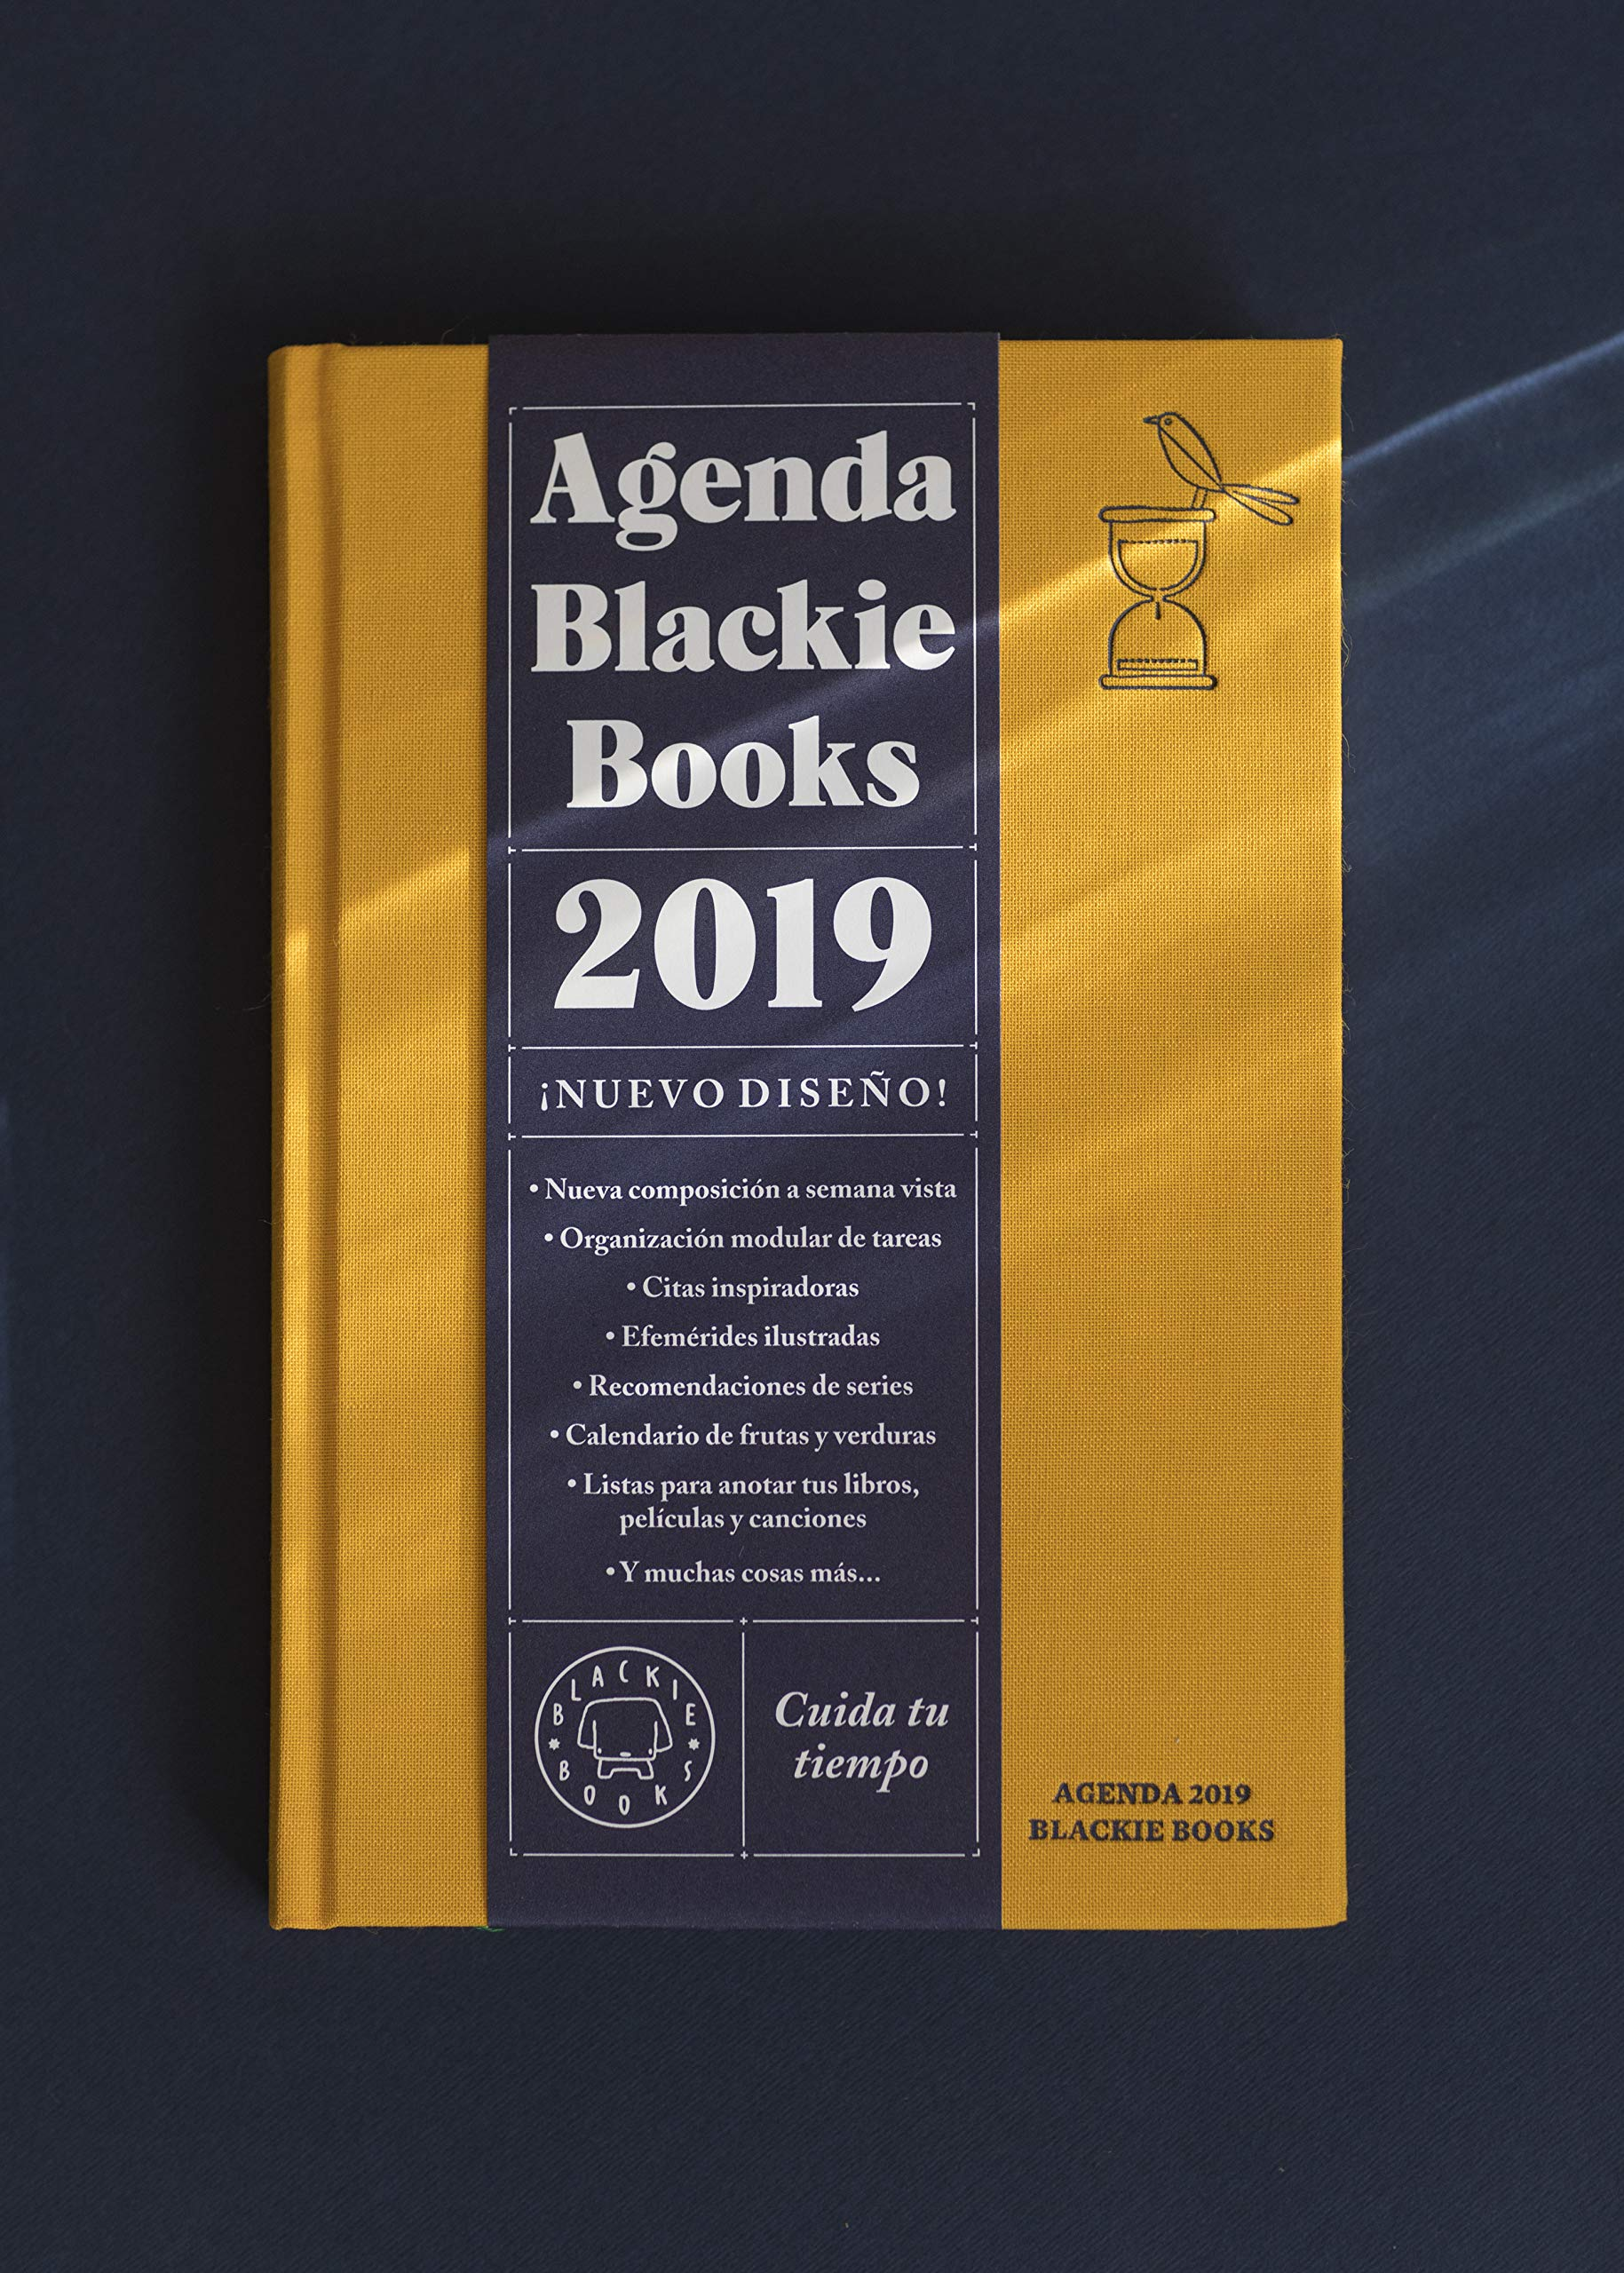 Agenda Blackie Books 2019: Cuida tu tiempo: Daniel López ...